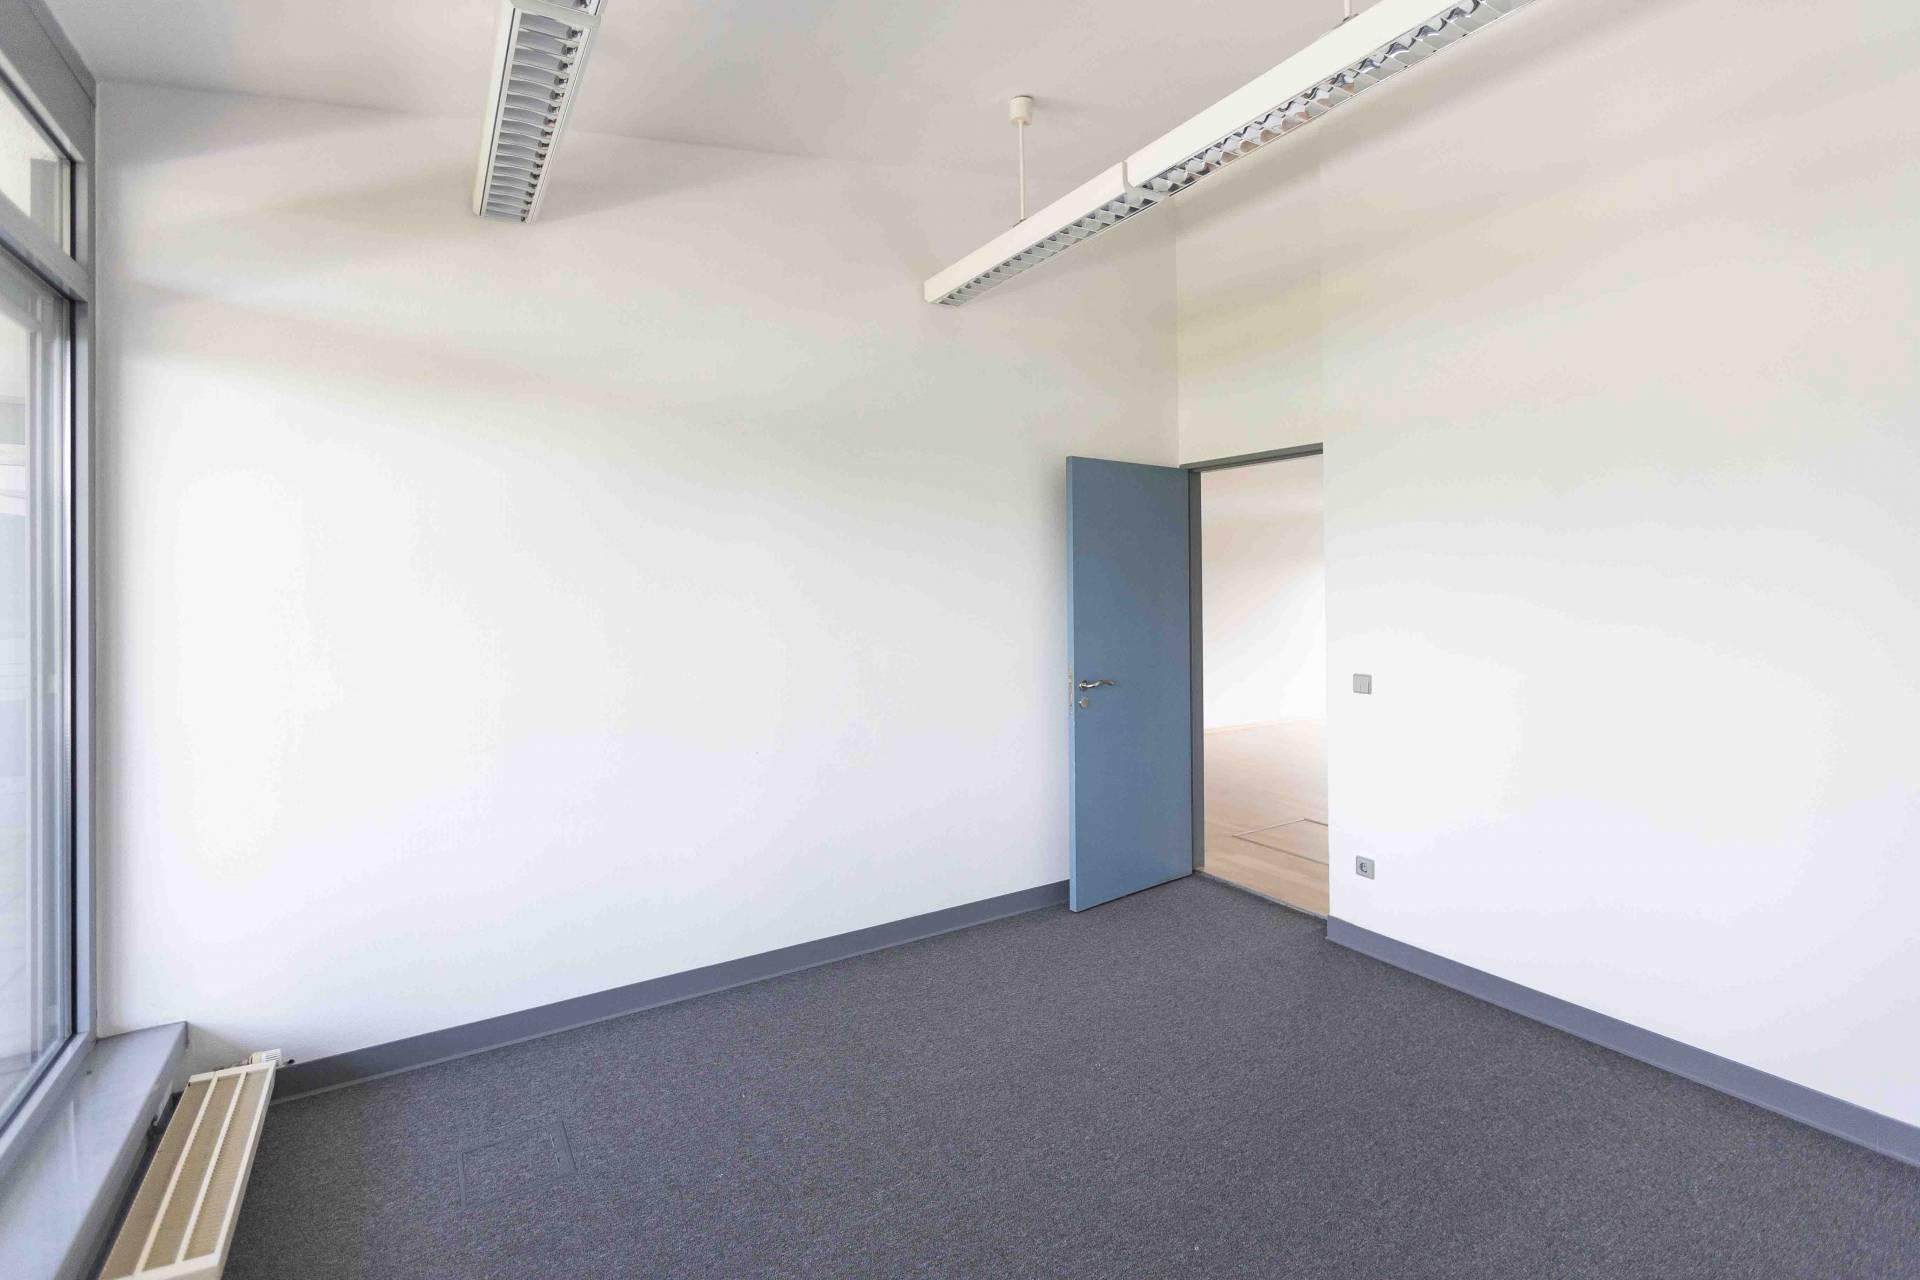 München coworking space